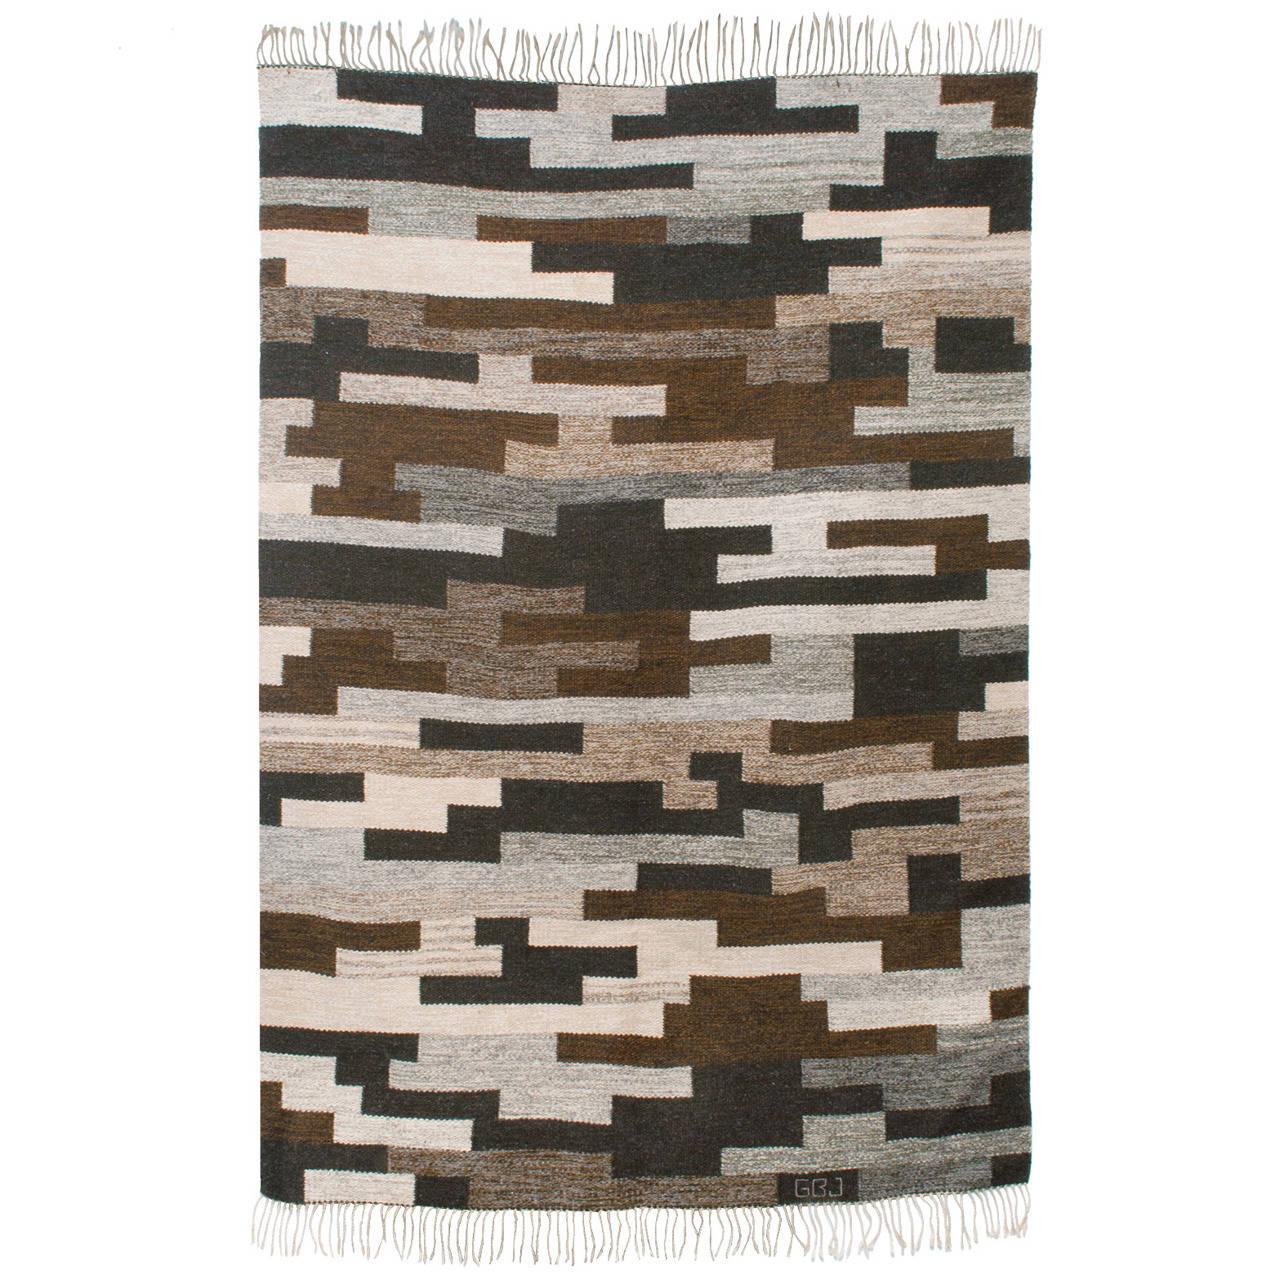 Modern Scandinavian Rug: Scandinavian Modern Flat-Weave Wool Rug In Heathered